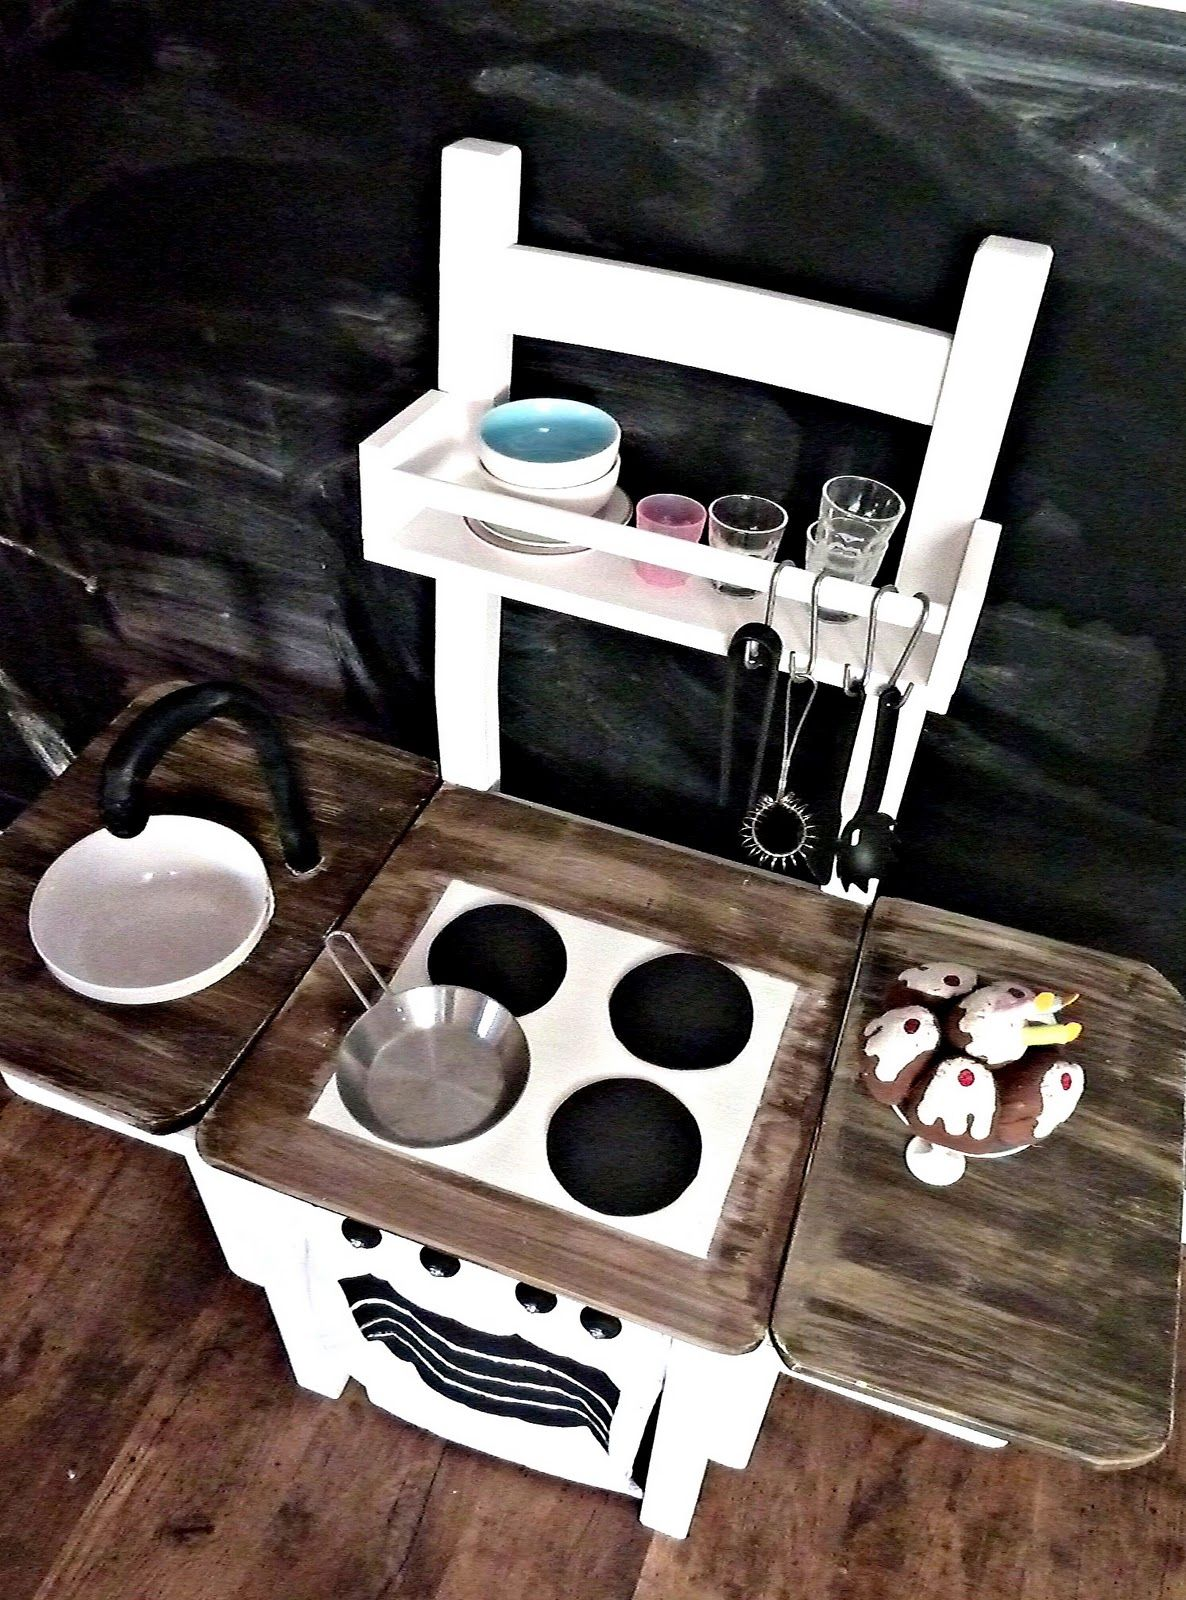 IKEA Hackers: Repurposed Ivar Chair Into A Kiddie Kitchen